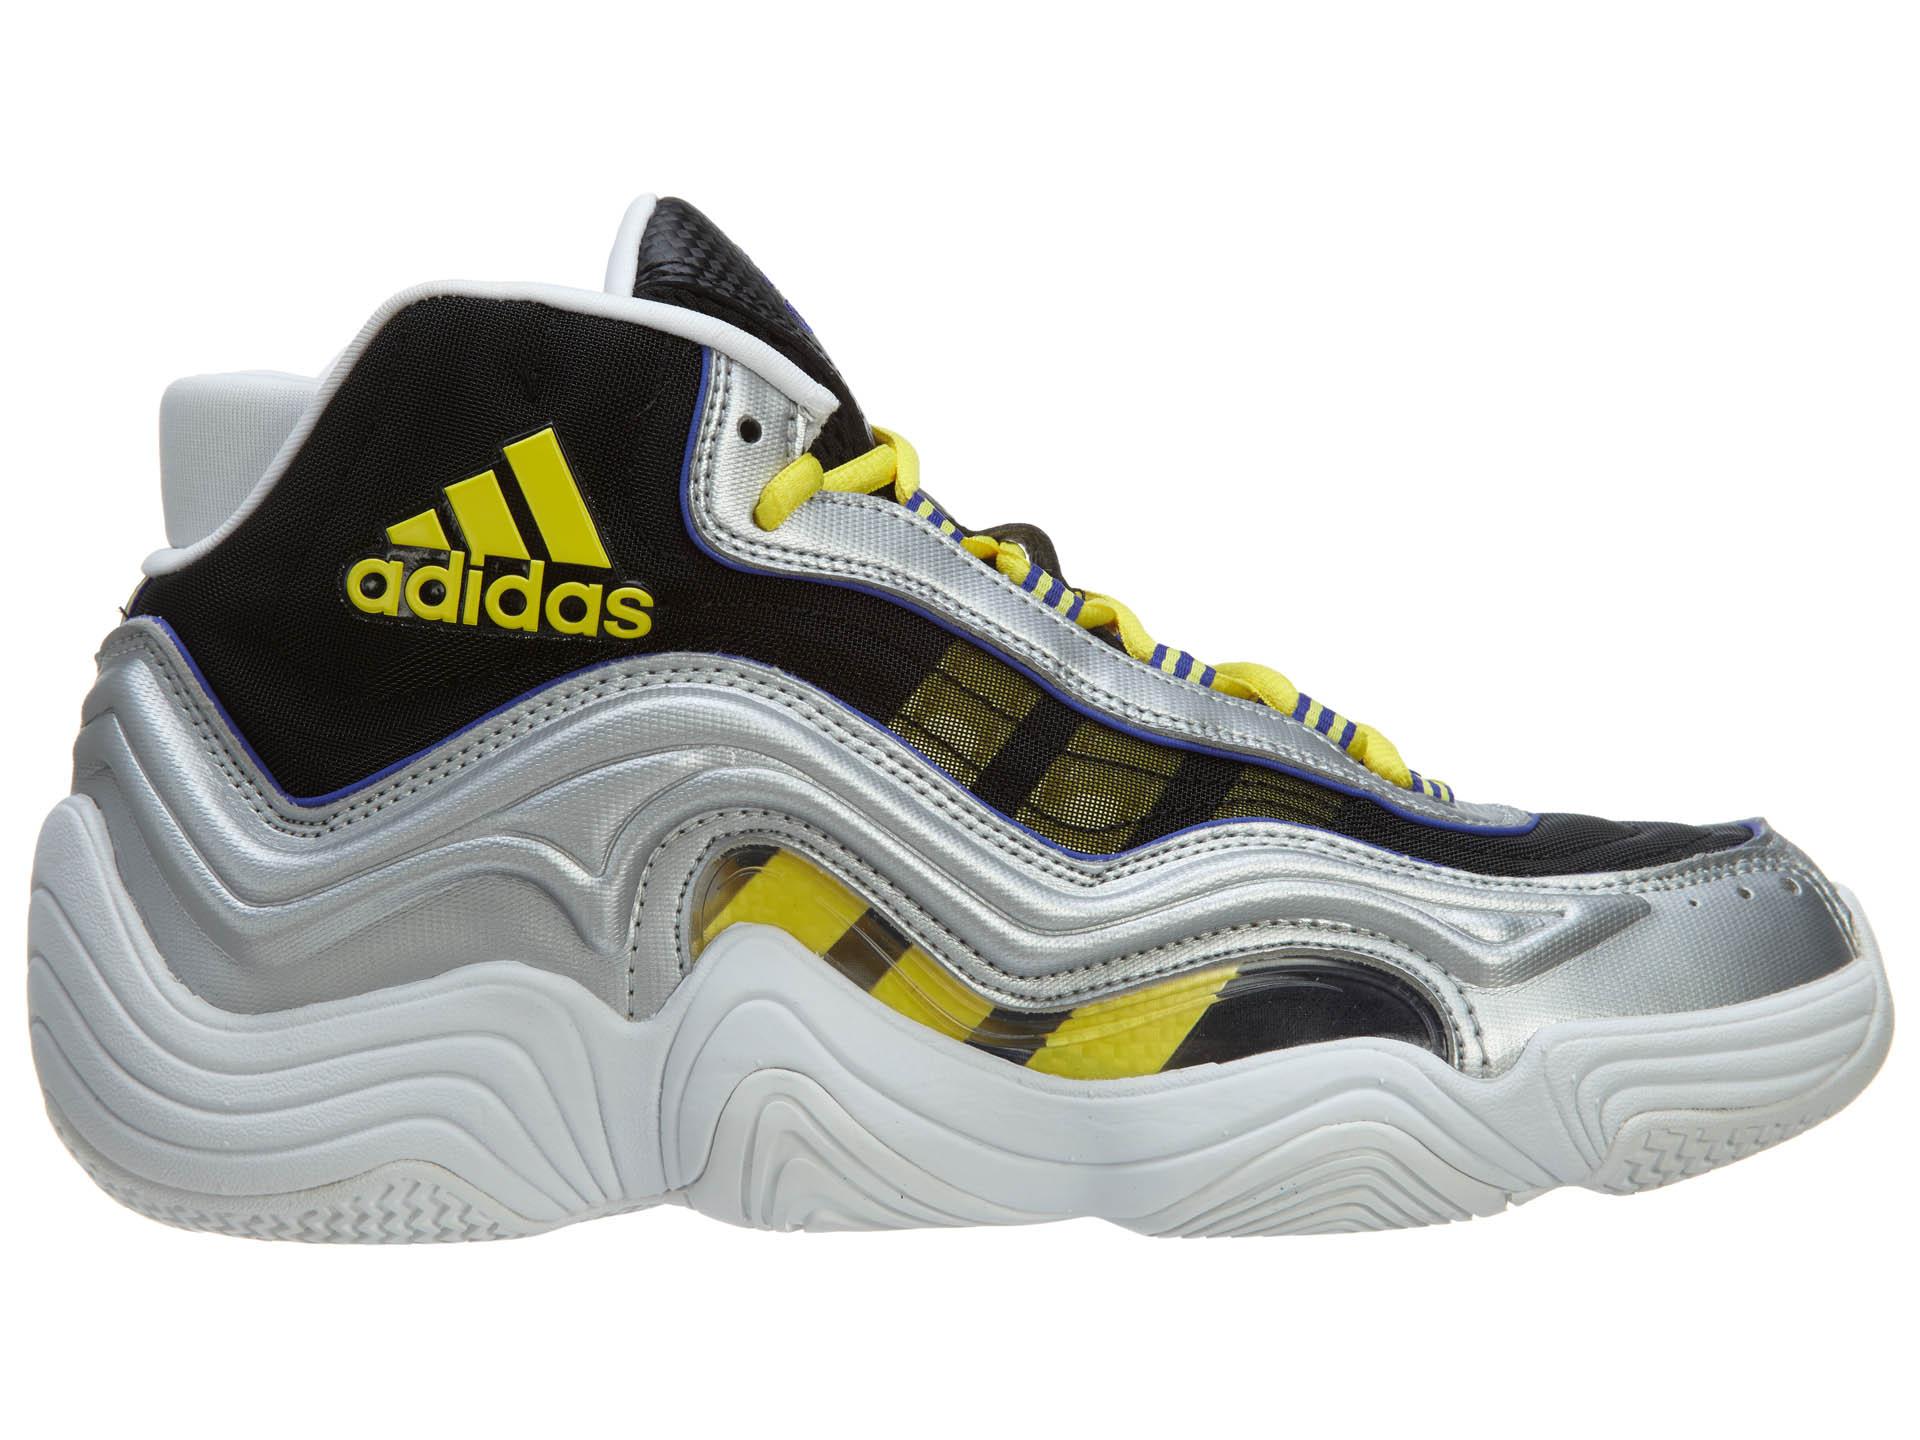 adidas crazy 2